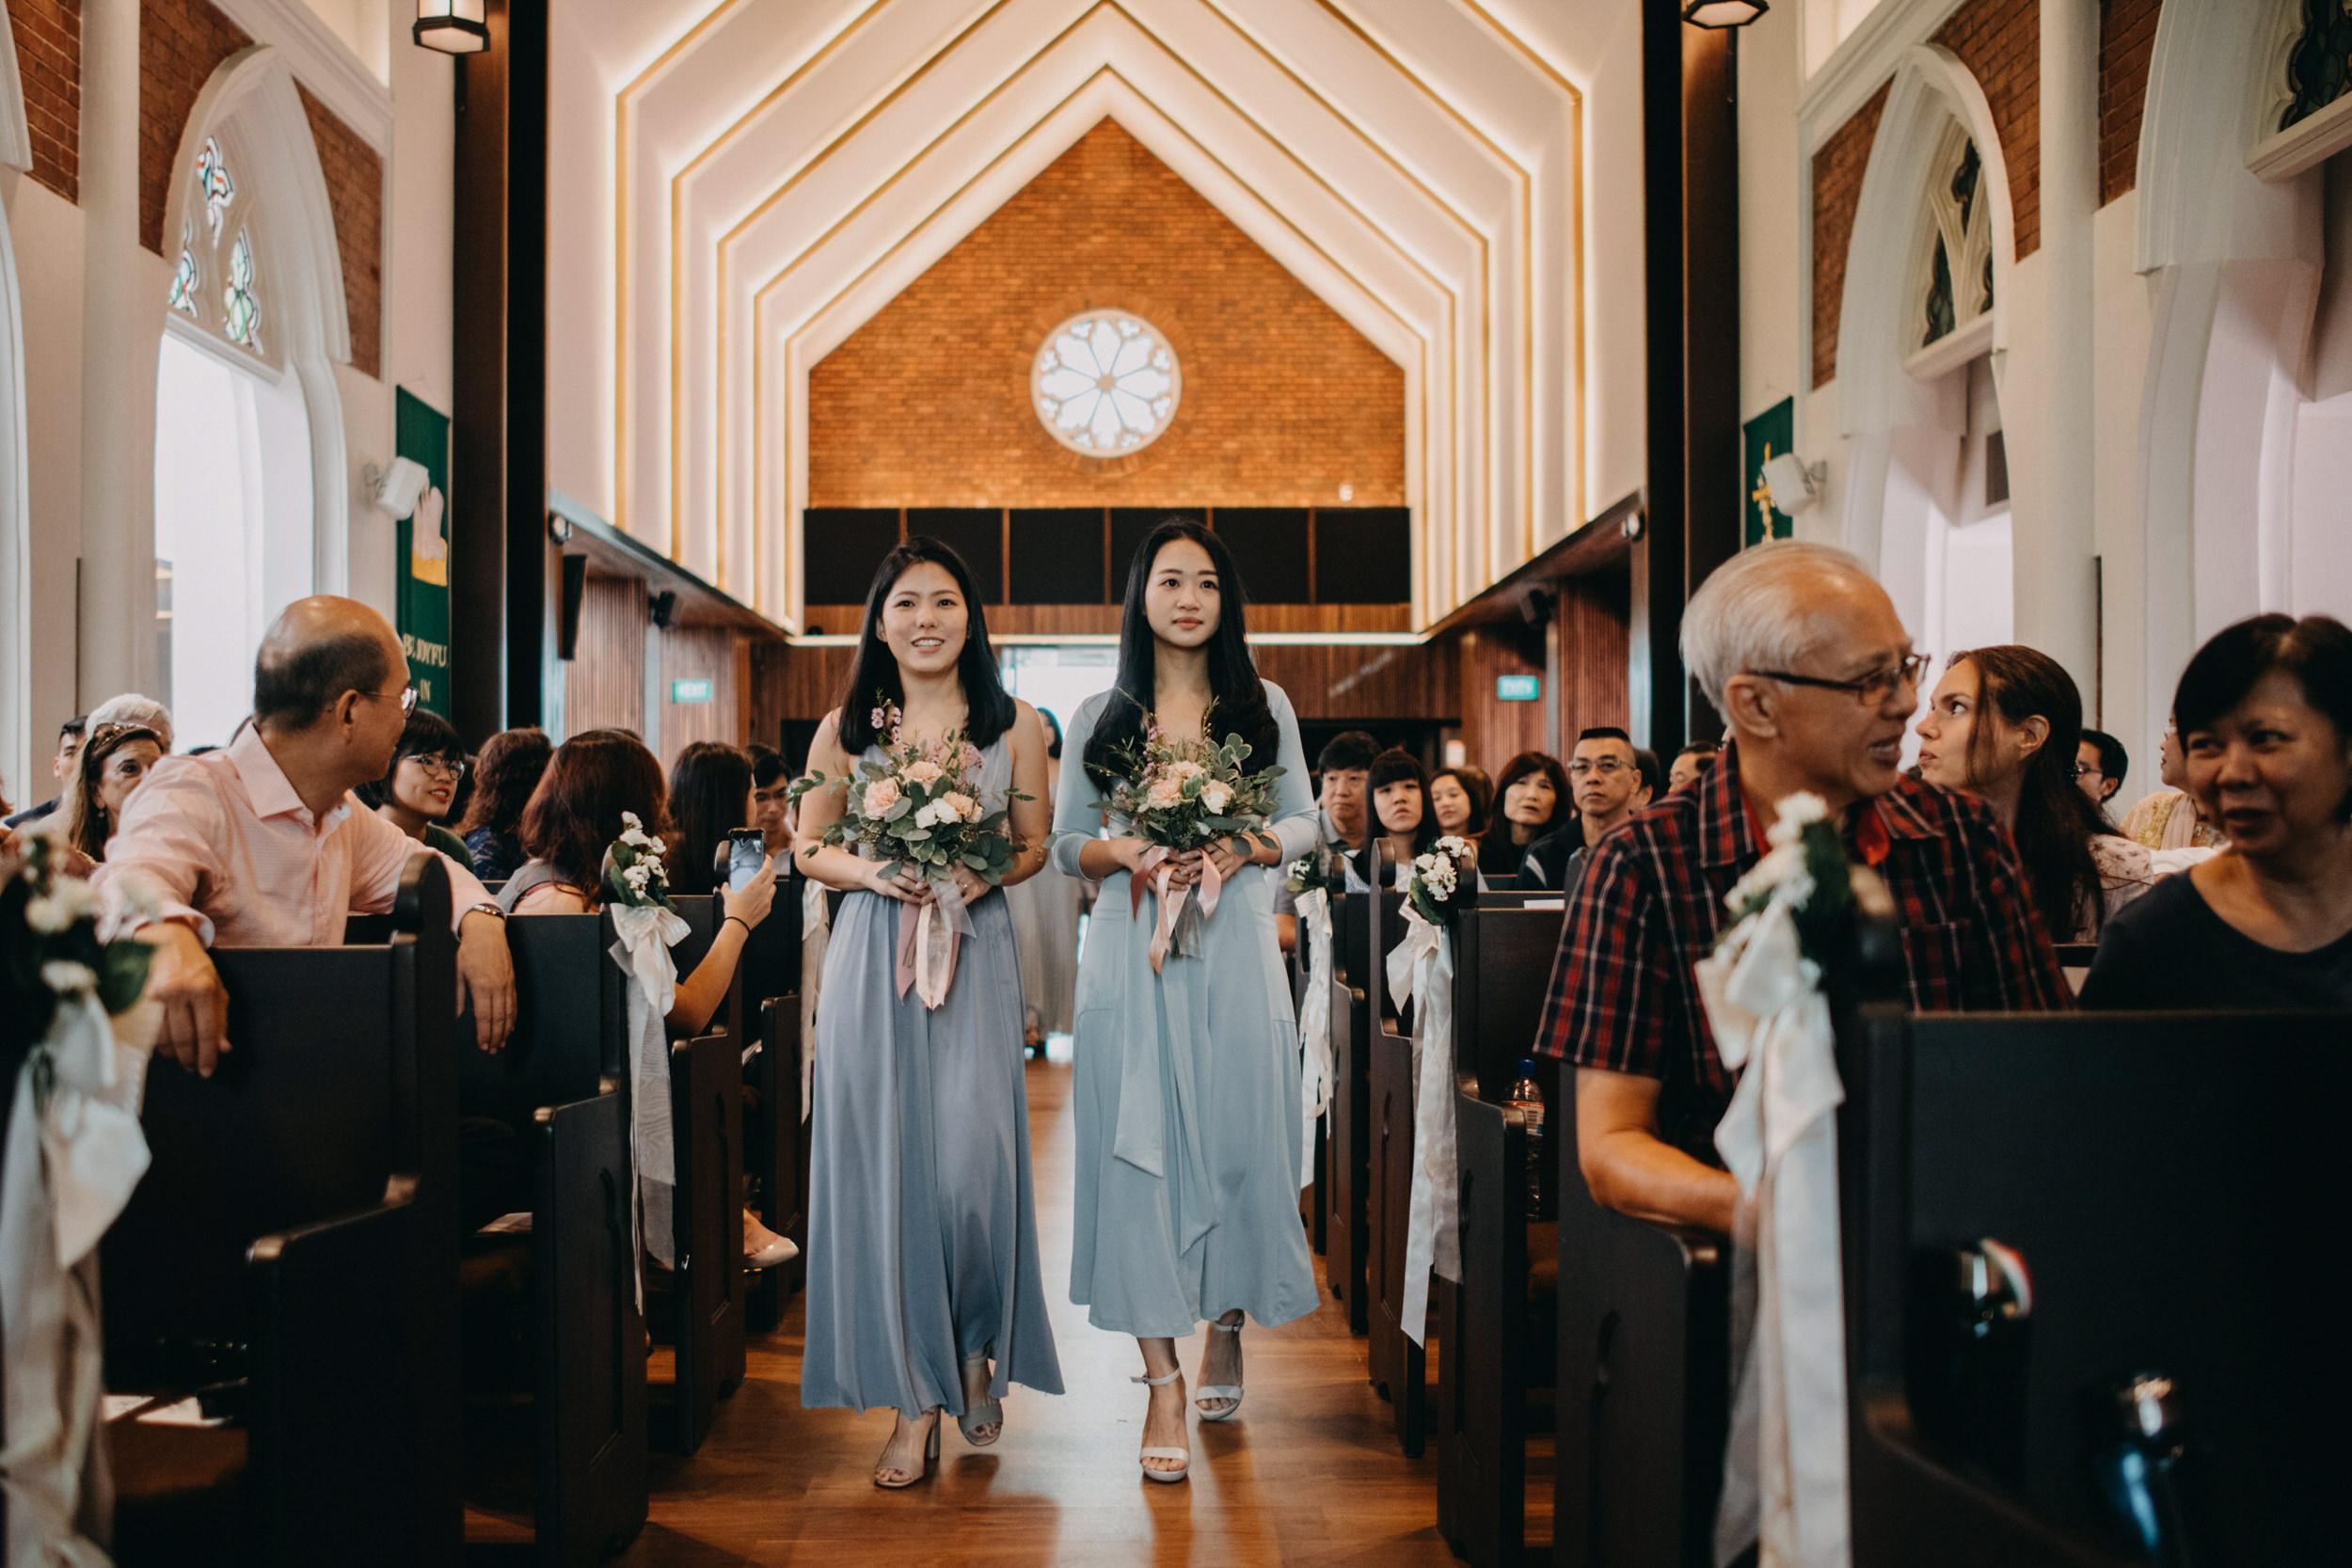 wesley methodist church, singapore